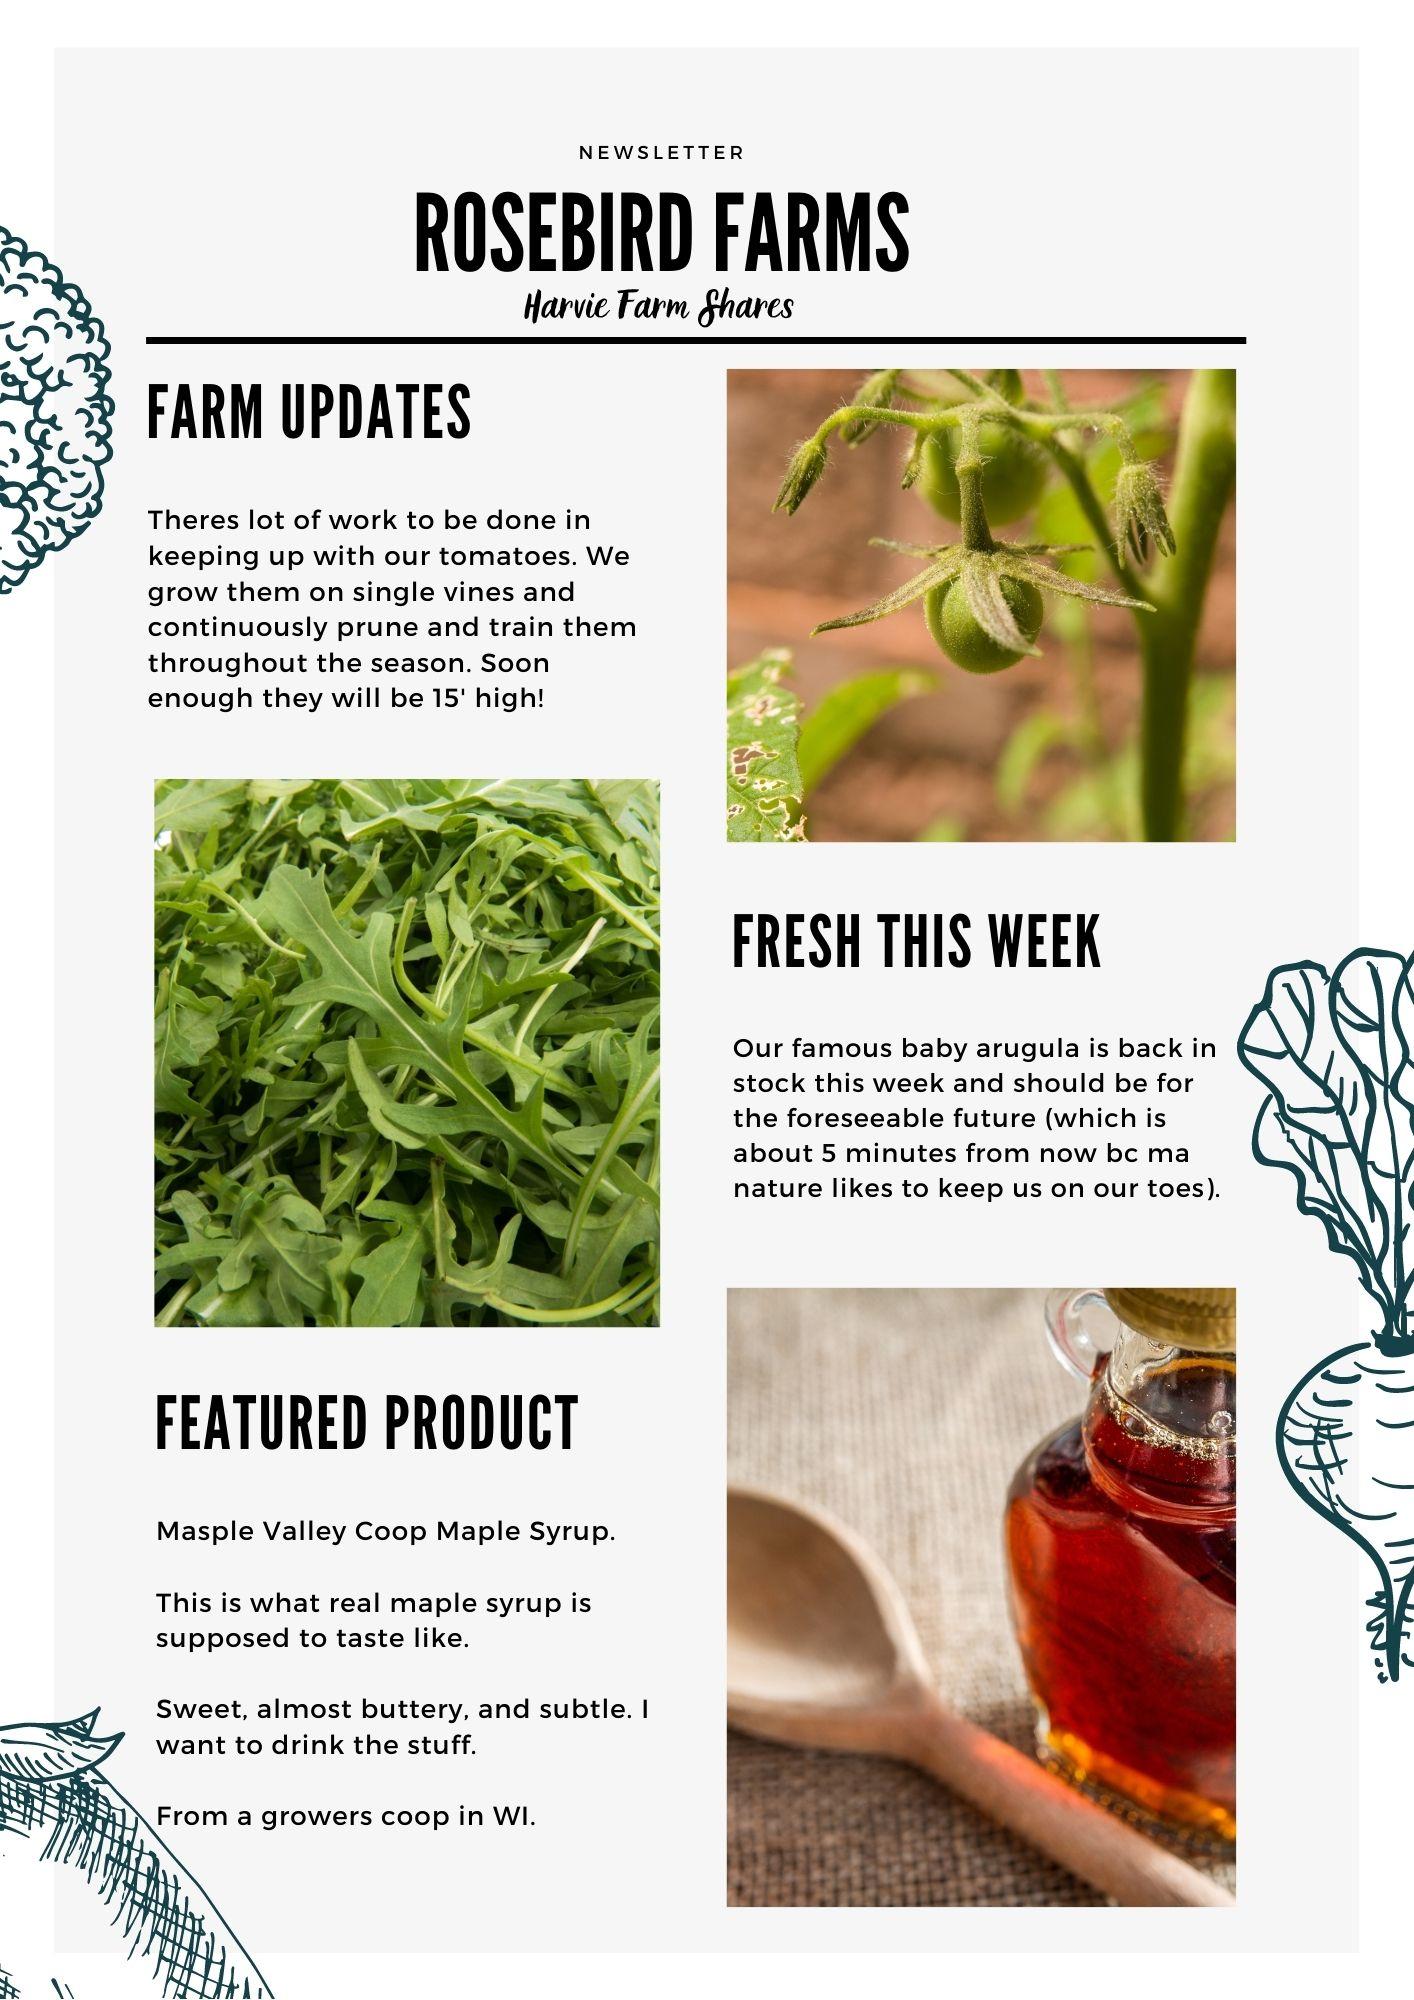 Farm Happenings for April 29, 2021